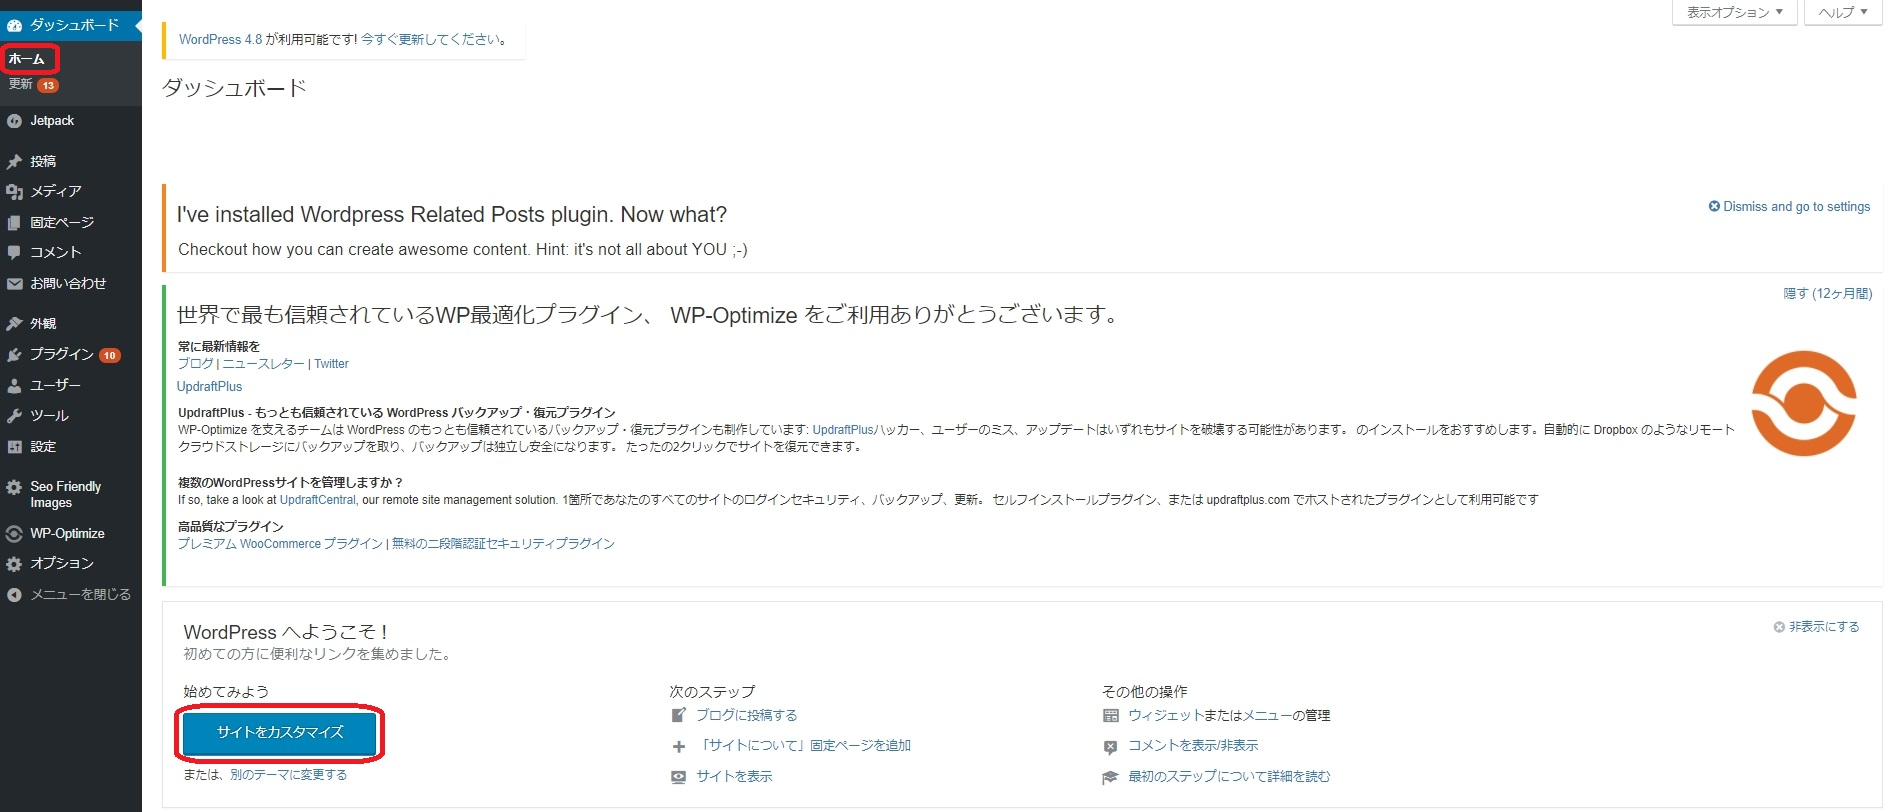 button-only@2x ワードプレスブログの背景色・背景画像を変更する方法